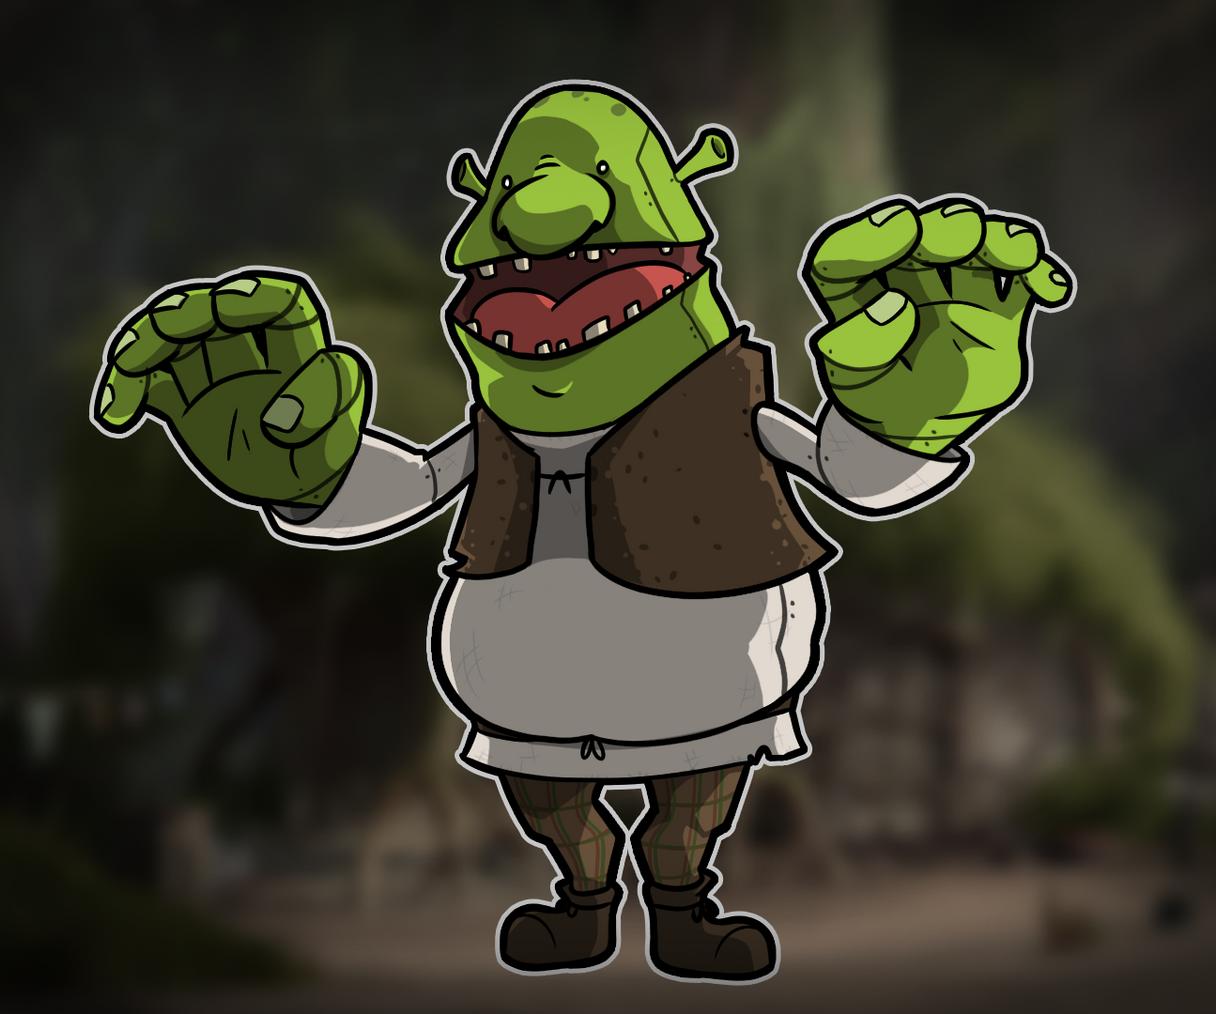 Robo-Shrek